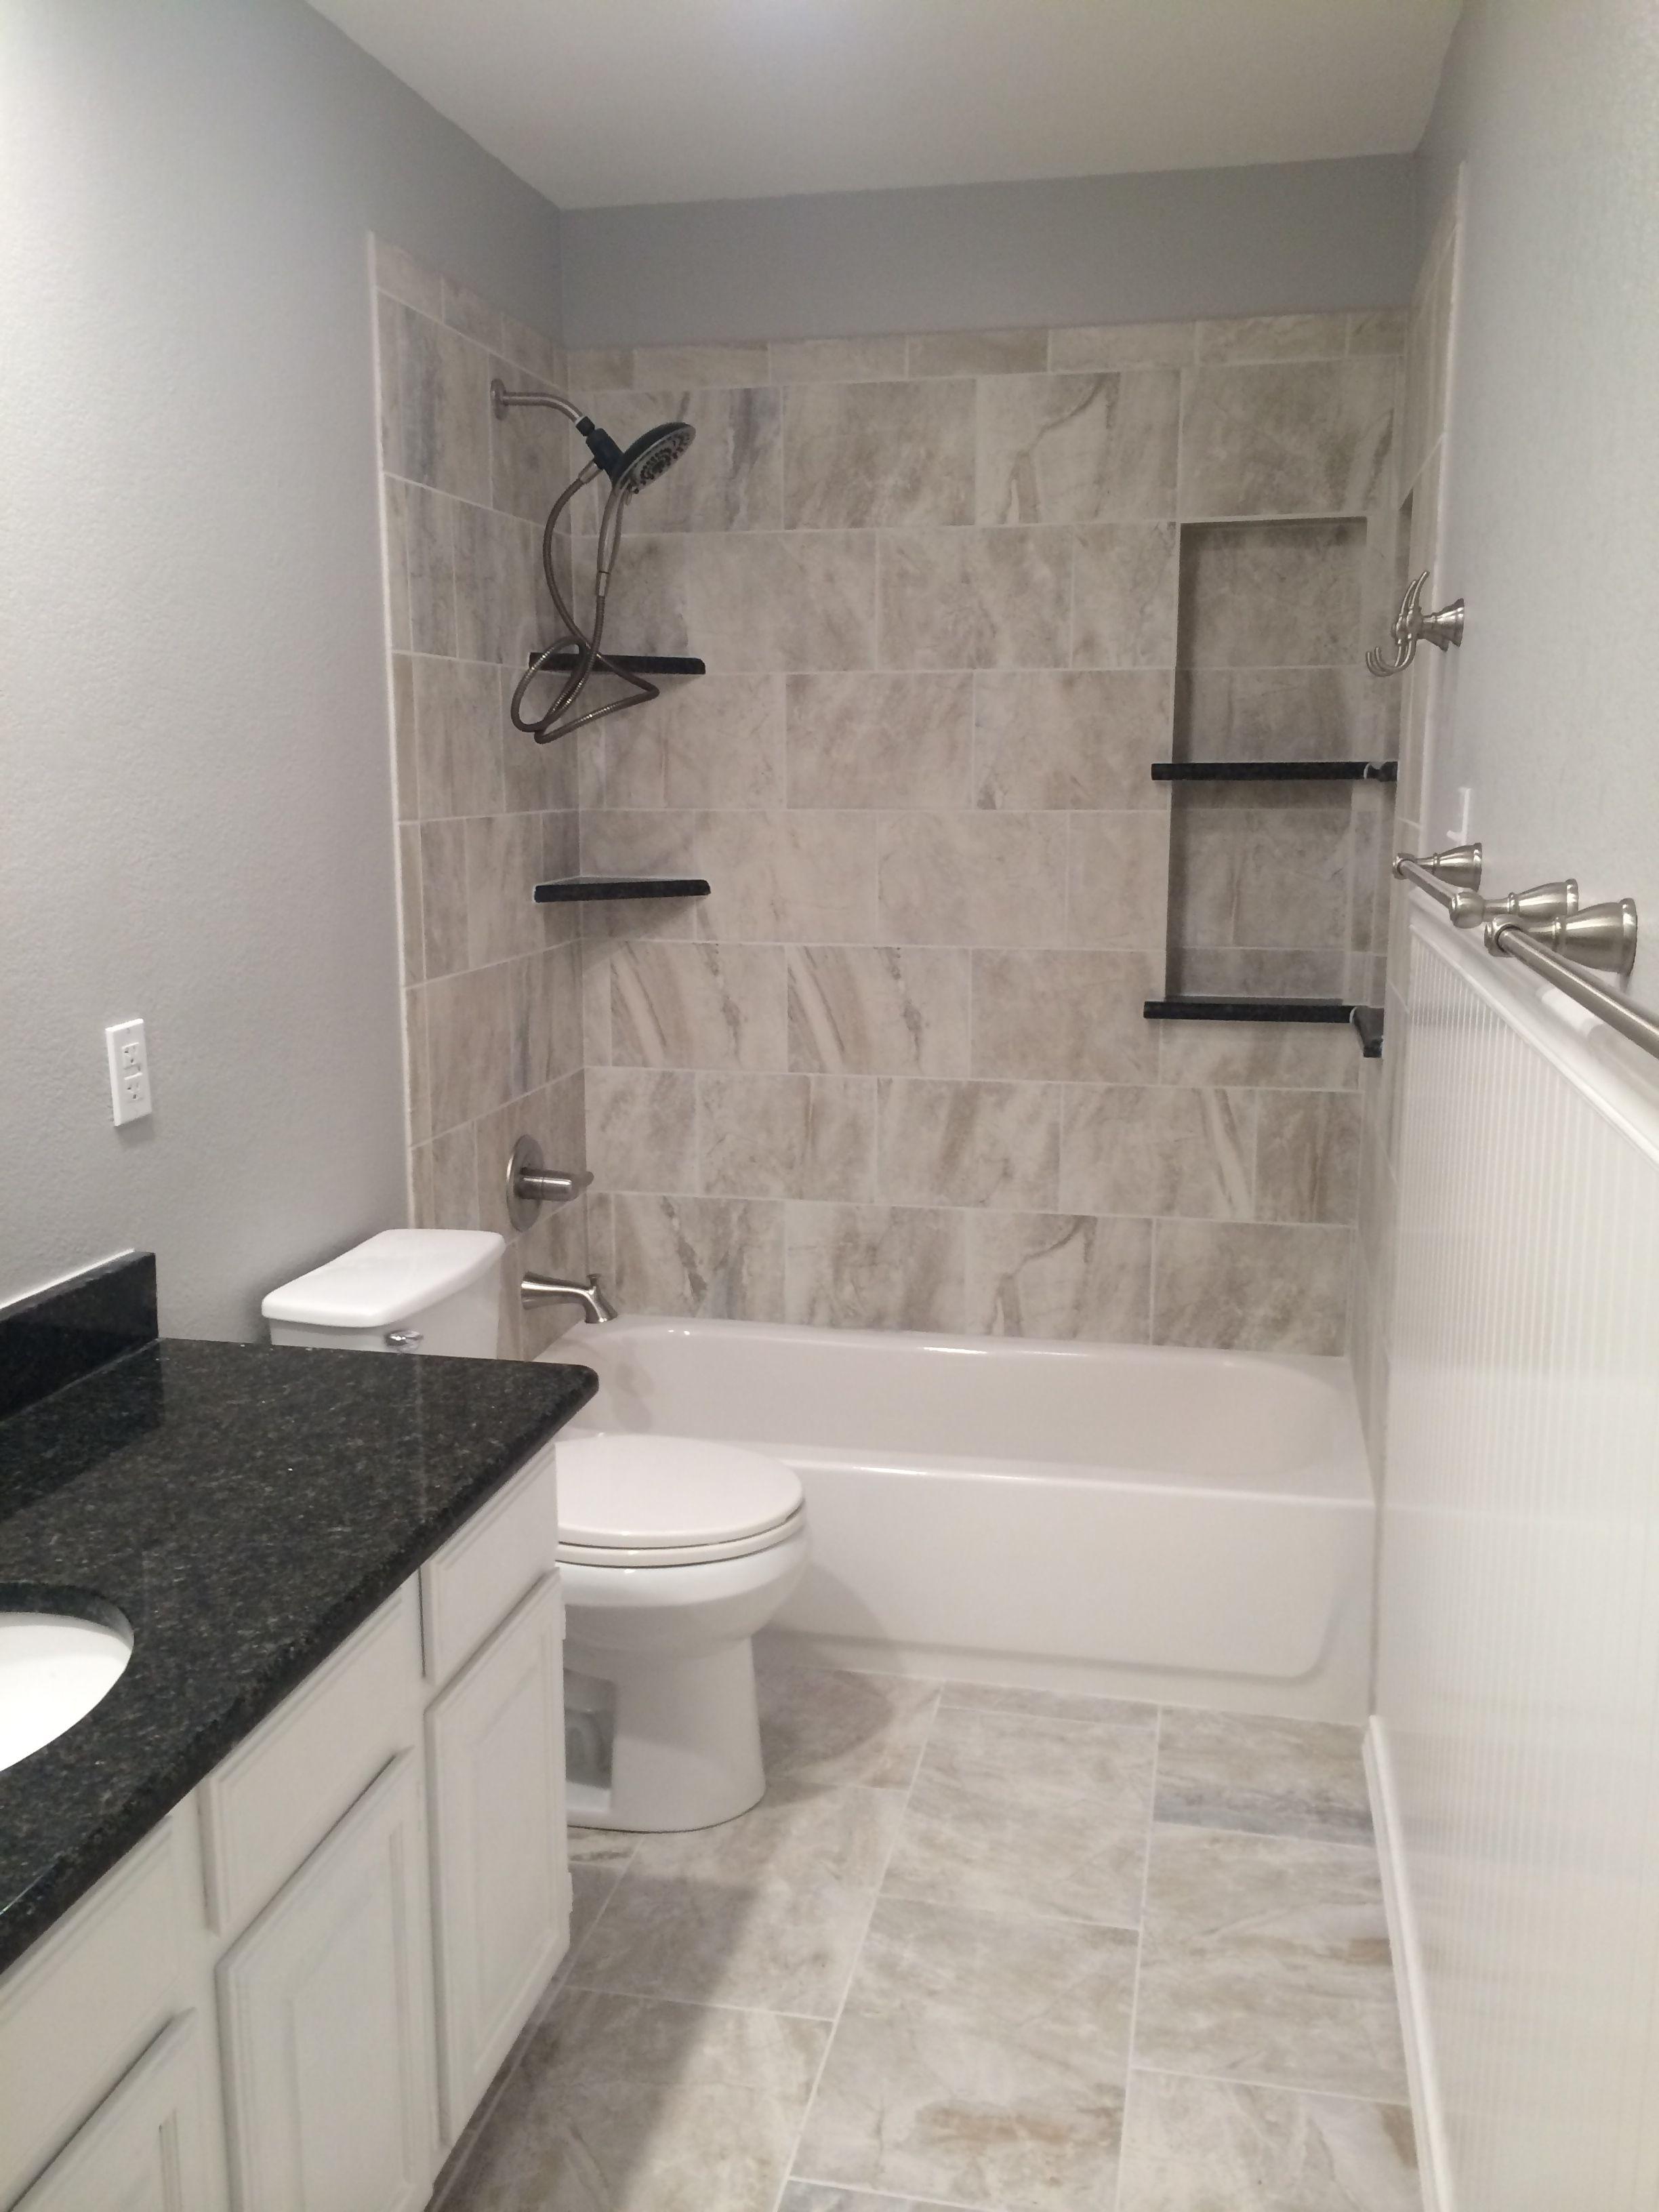 A Better Home Services  Grapevine, TX 5 - HomeAdvisor  Home